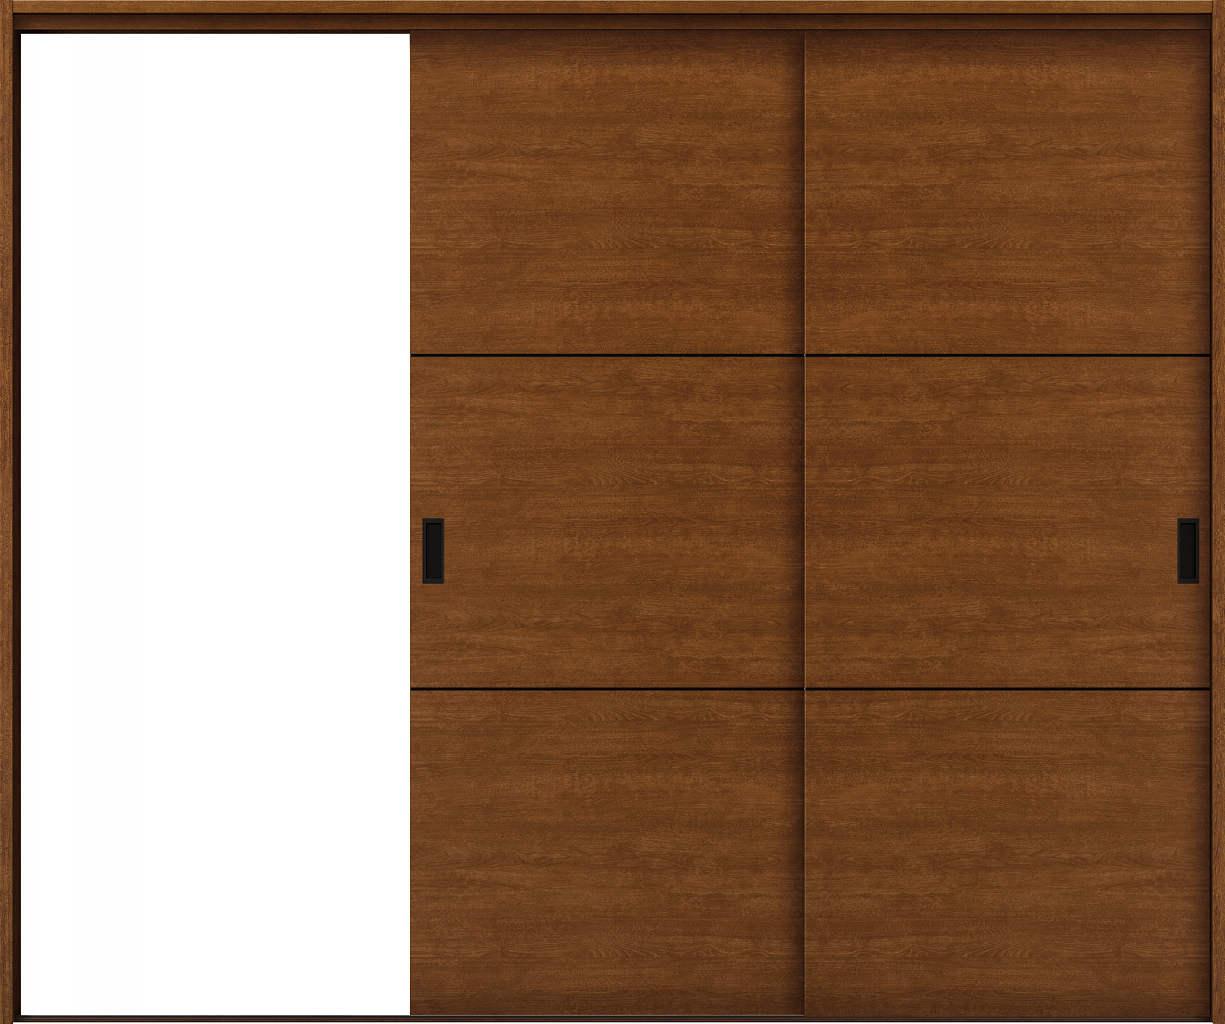 YKKAP室内引戸 ラフォレスタ[スタイリッシュ][木目横] 2枚片引き戸 Y10 ケーシング枠:[幅2433mm×高2033mm]